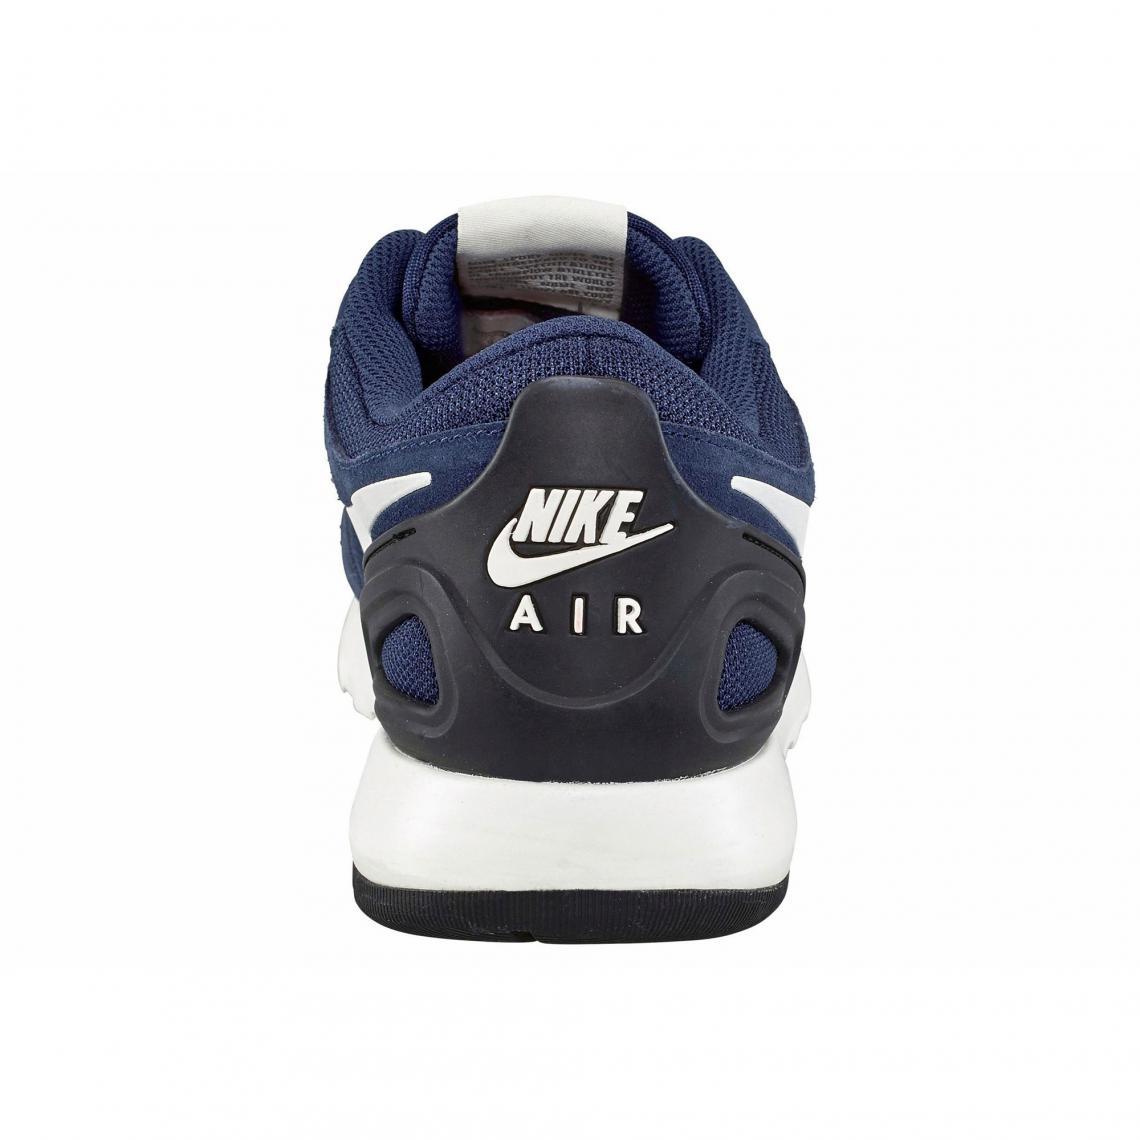 Chaussures Vibenna Gris Air Running De Bleu 3suisses Nike Homme rBFwarxq4